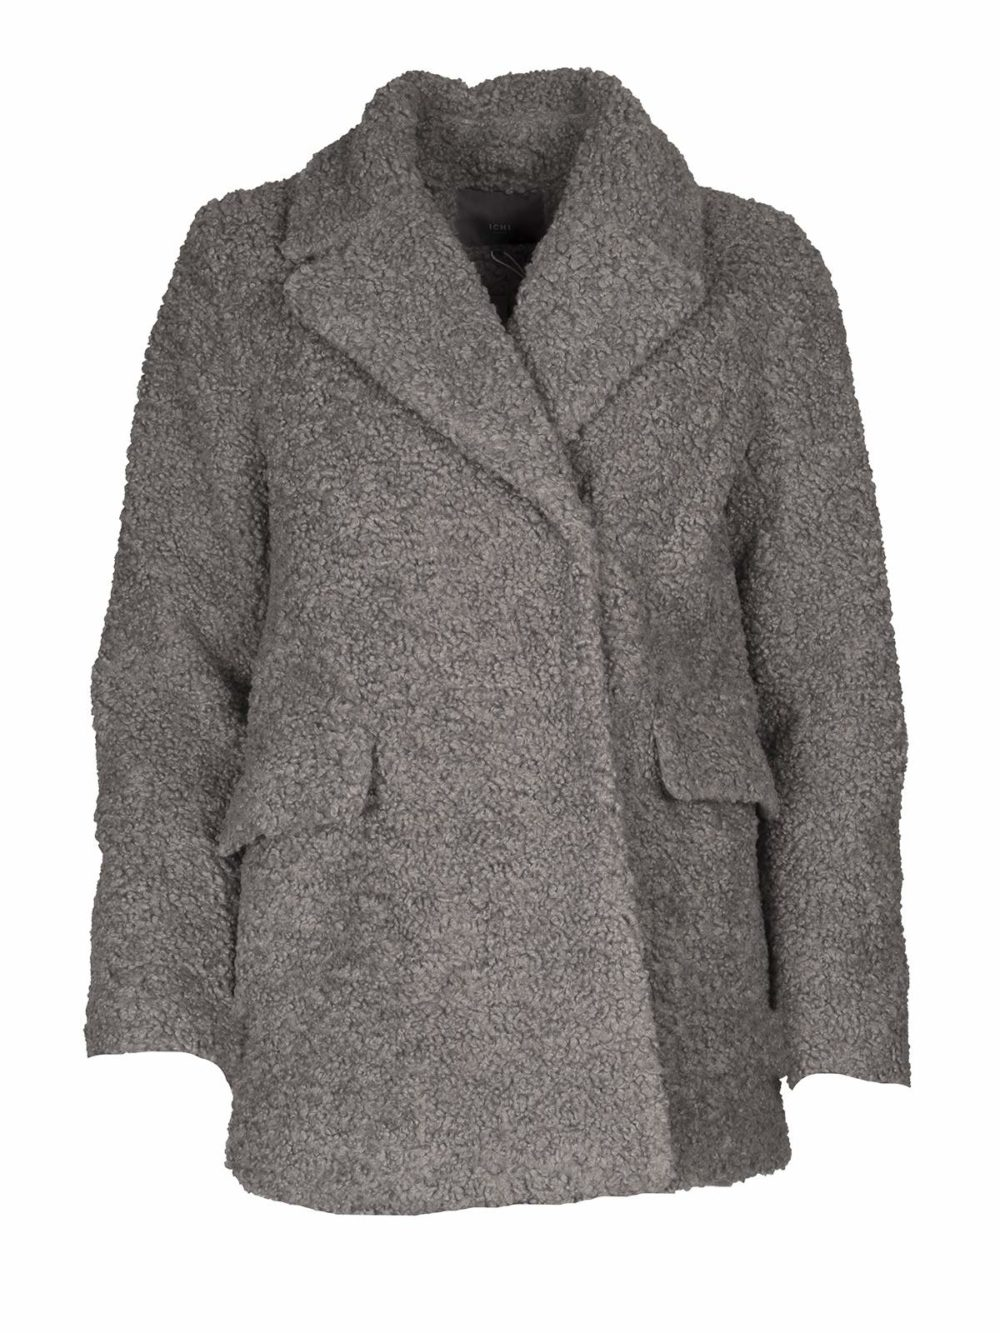 Snela Jacket ICHI Katie Kerr Women's Clothing